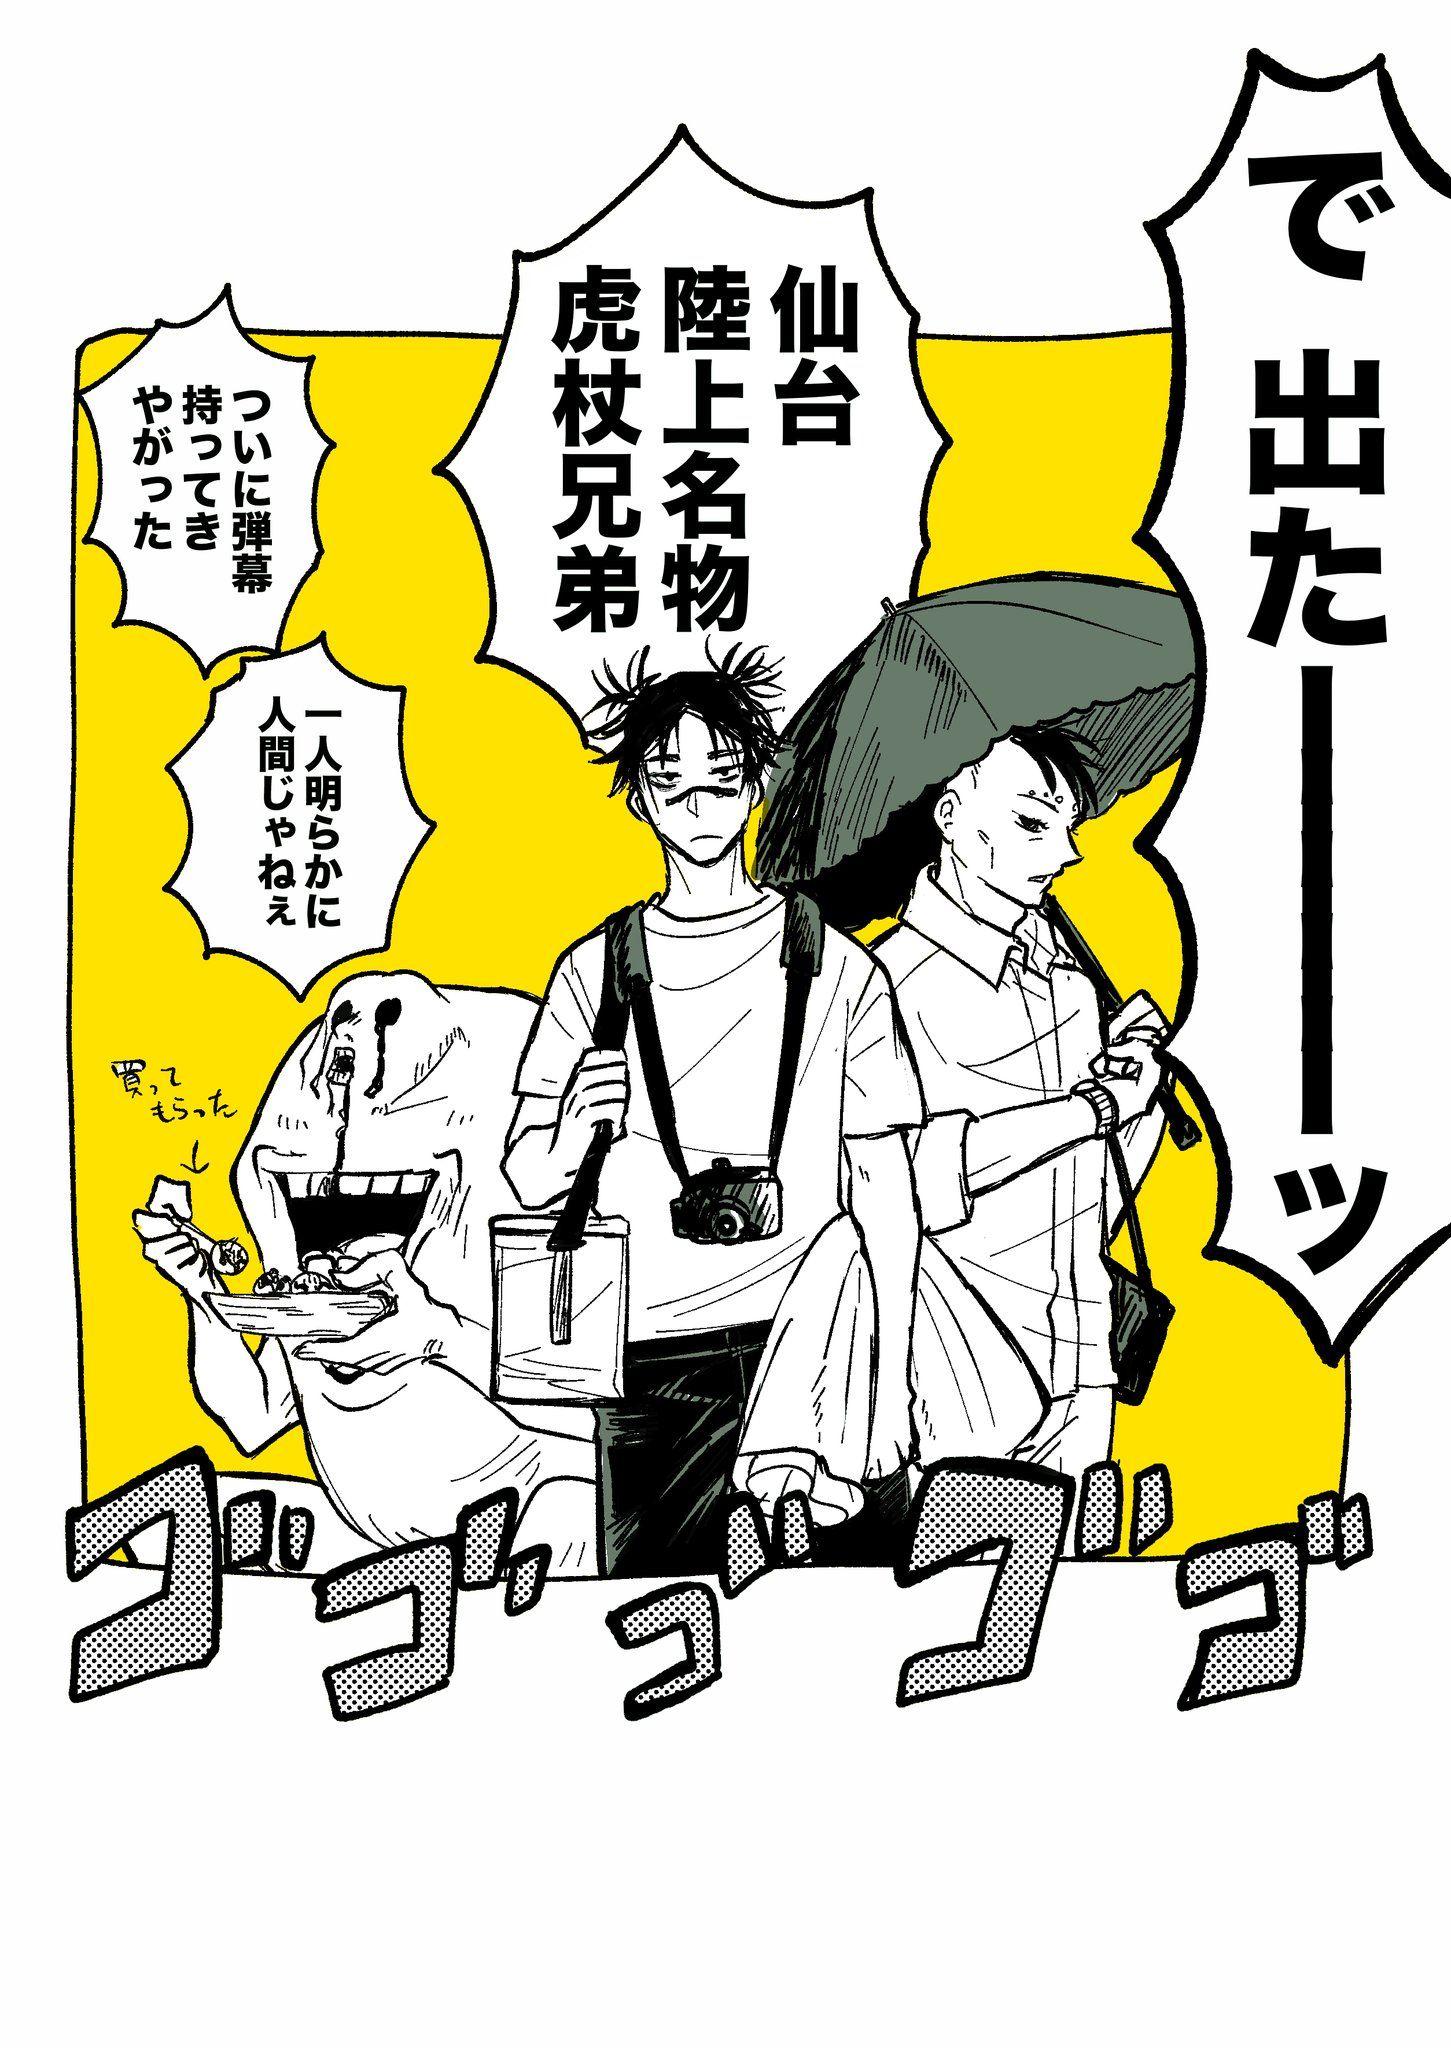 twitter manga jujutsu comic book cover